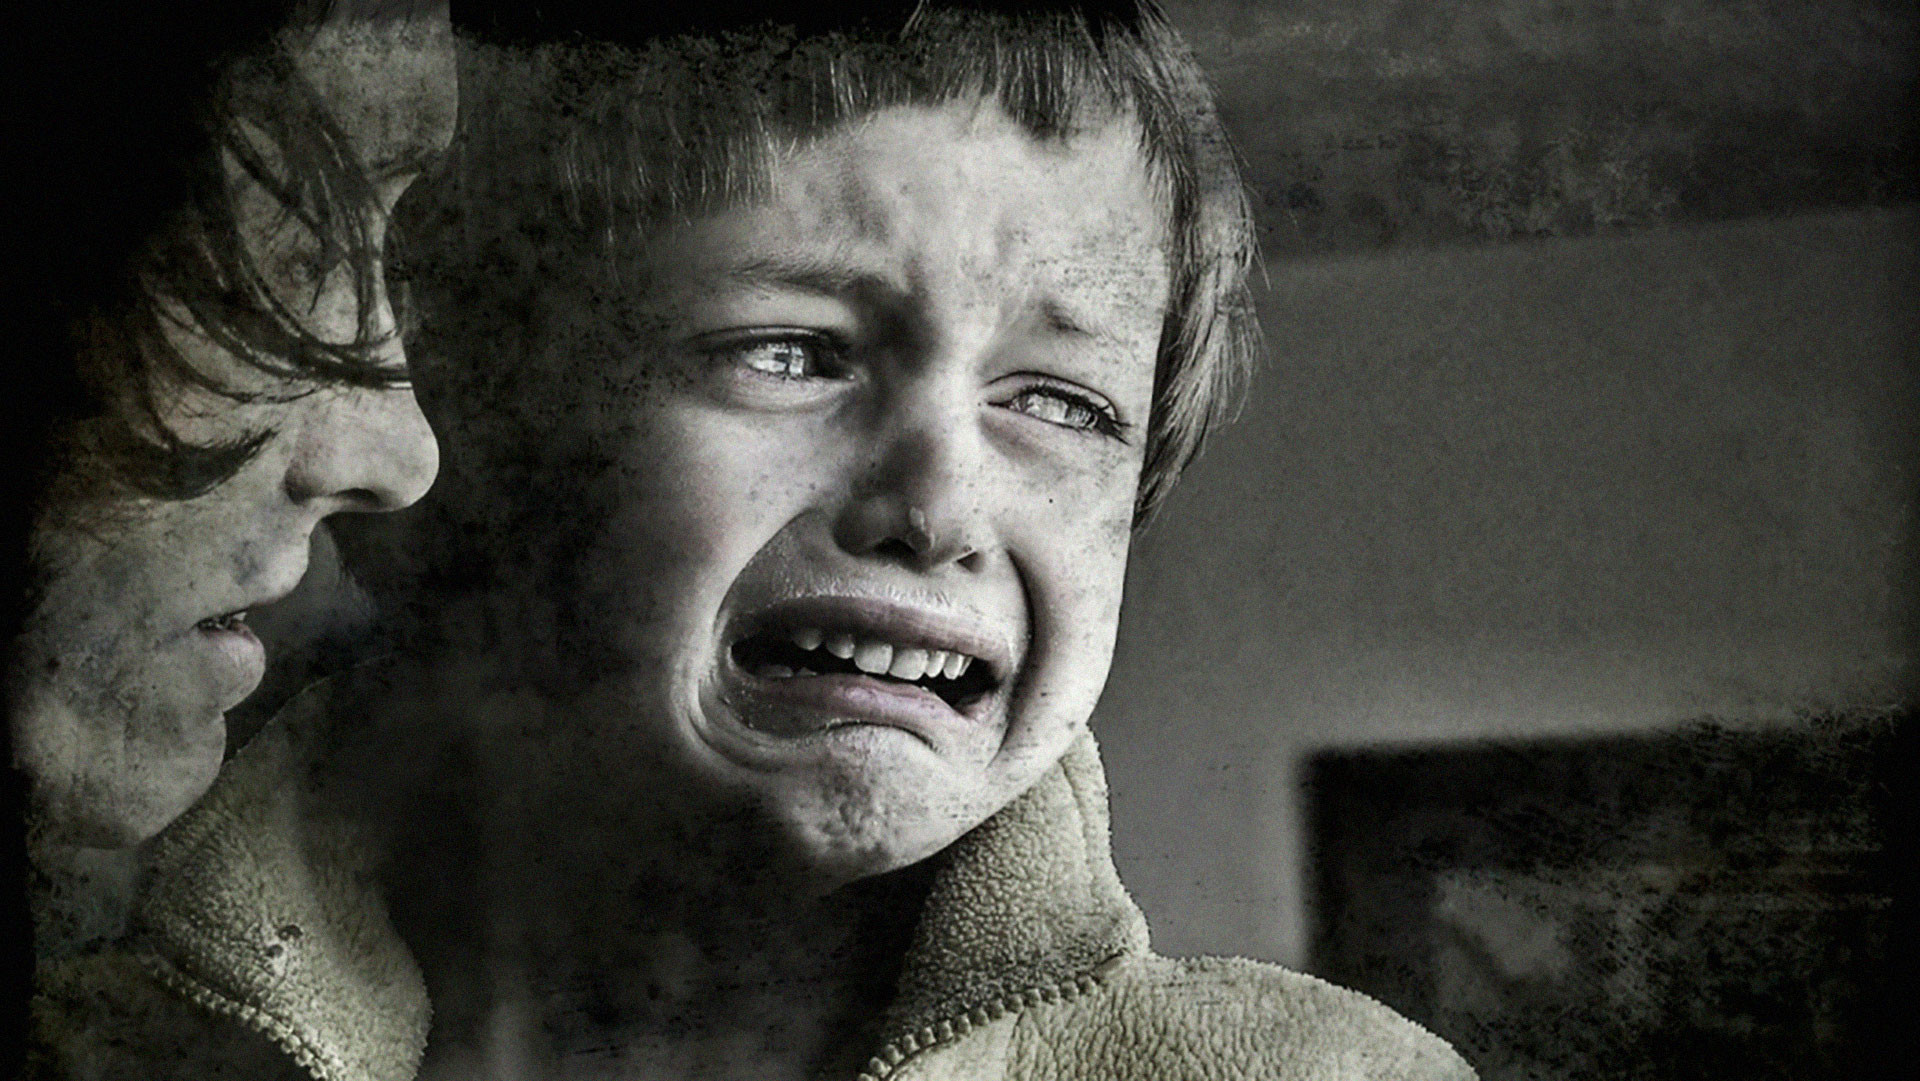 Картинки больно дети плачут